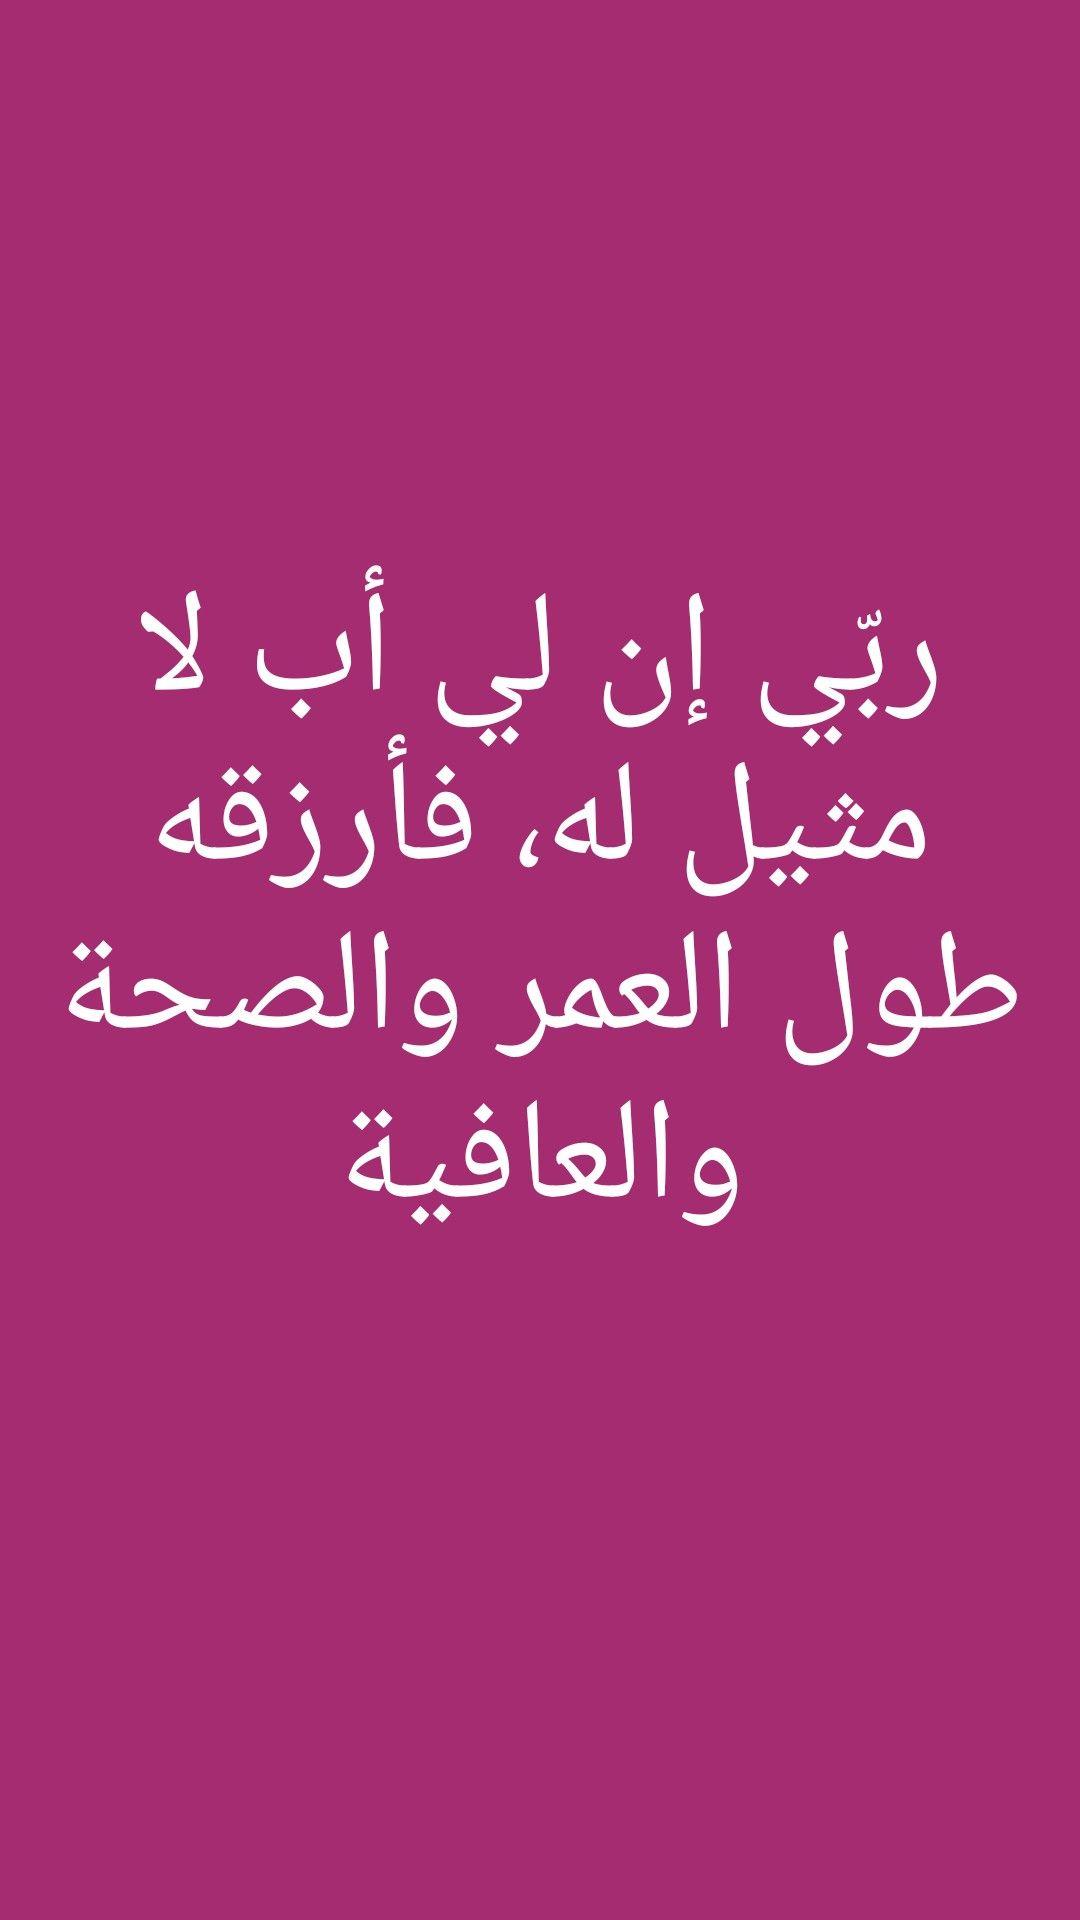 Pin By حگگايةة ححب On تنزيلي Arabic Words Words Anatomy